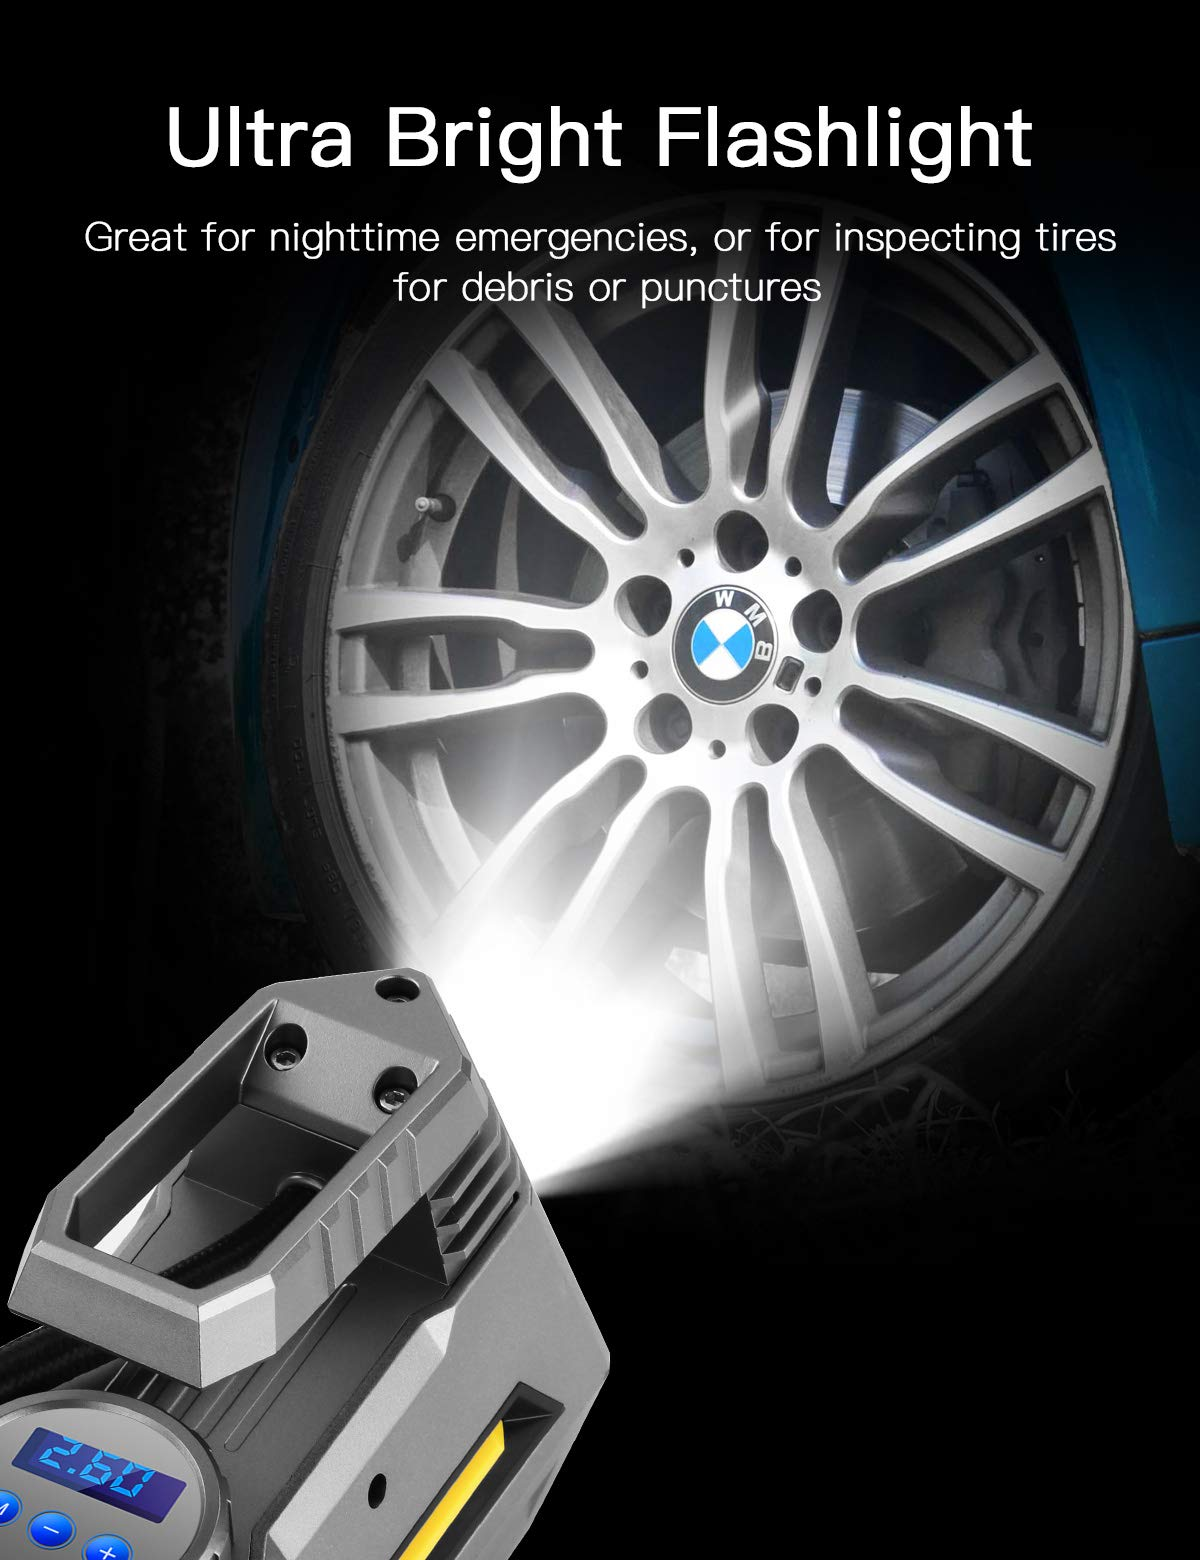 JOYROOM Portable Air Compressor Tire Inflator - Car Tire Pump with Digital Pressure Gauge (150 PSI 12V DC), Bright Emergency Flashlight - for Auto, Trucks, Bicycles, Balls by JOYROOM (Image #4)